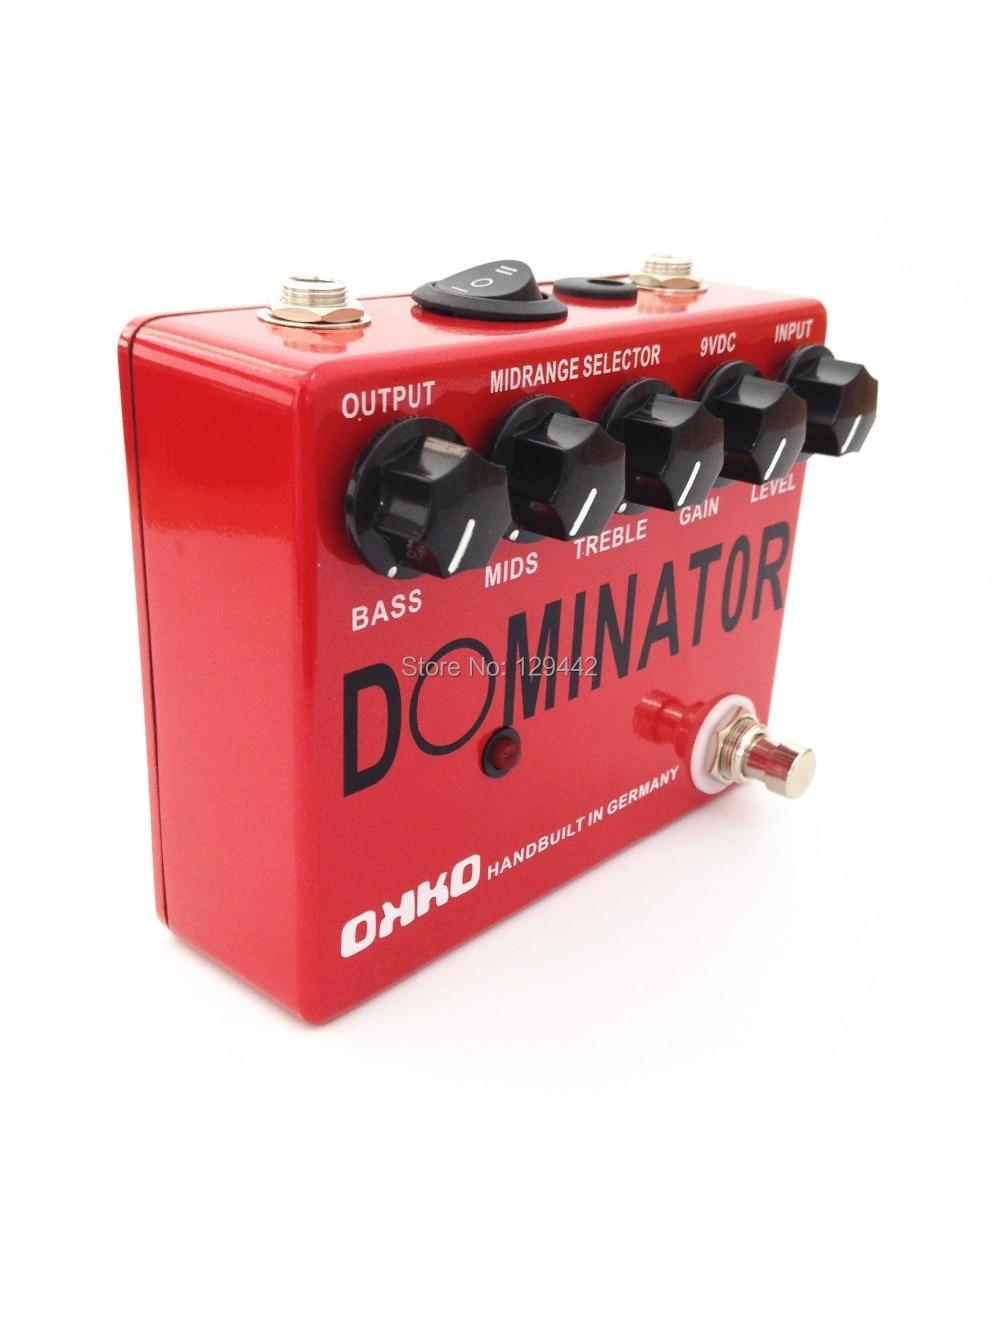 okko dominator powerfull dynamic high gain distortion guitar effect pedal guitar pedals new. Black Bedroom Furniture Sets. Home Design Ideas